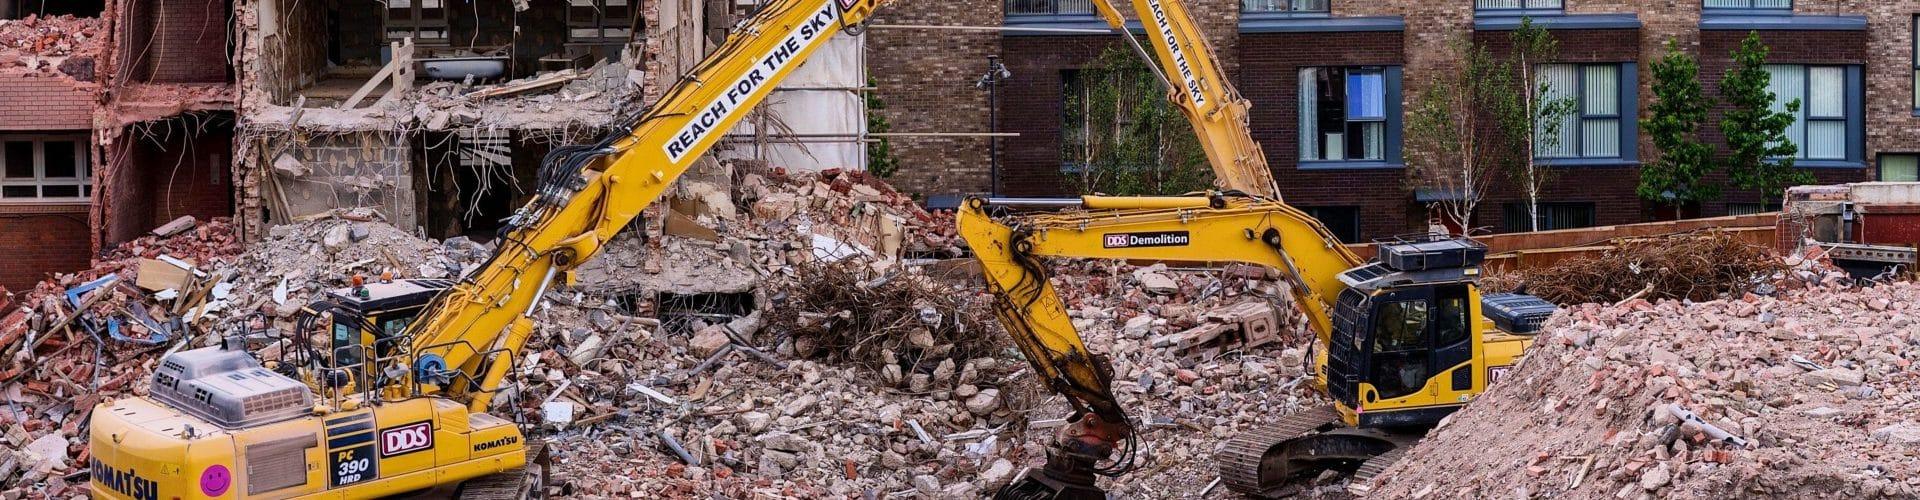 building demolition project